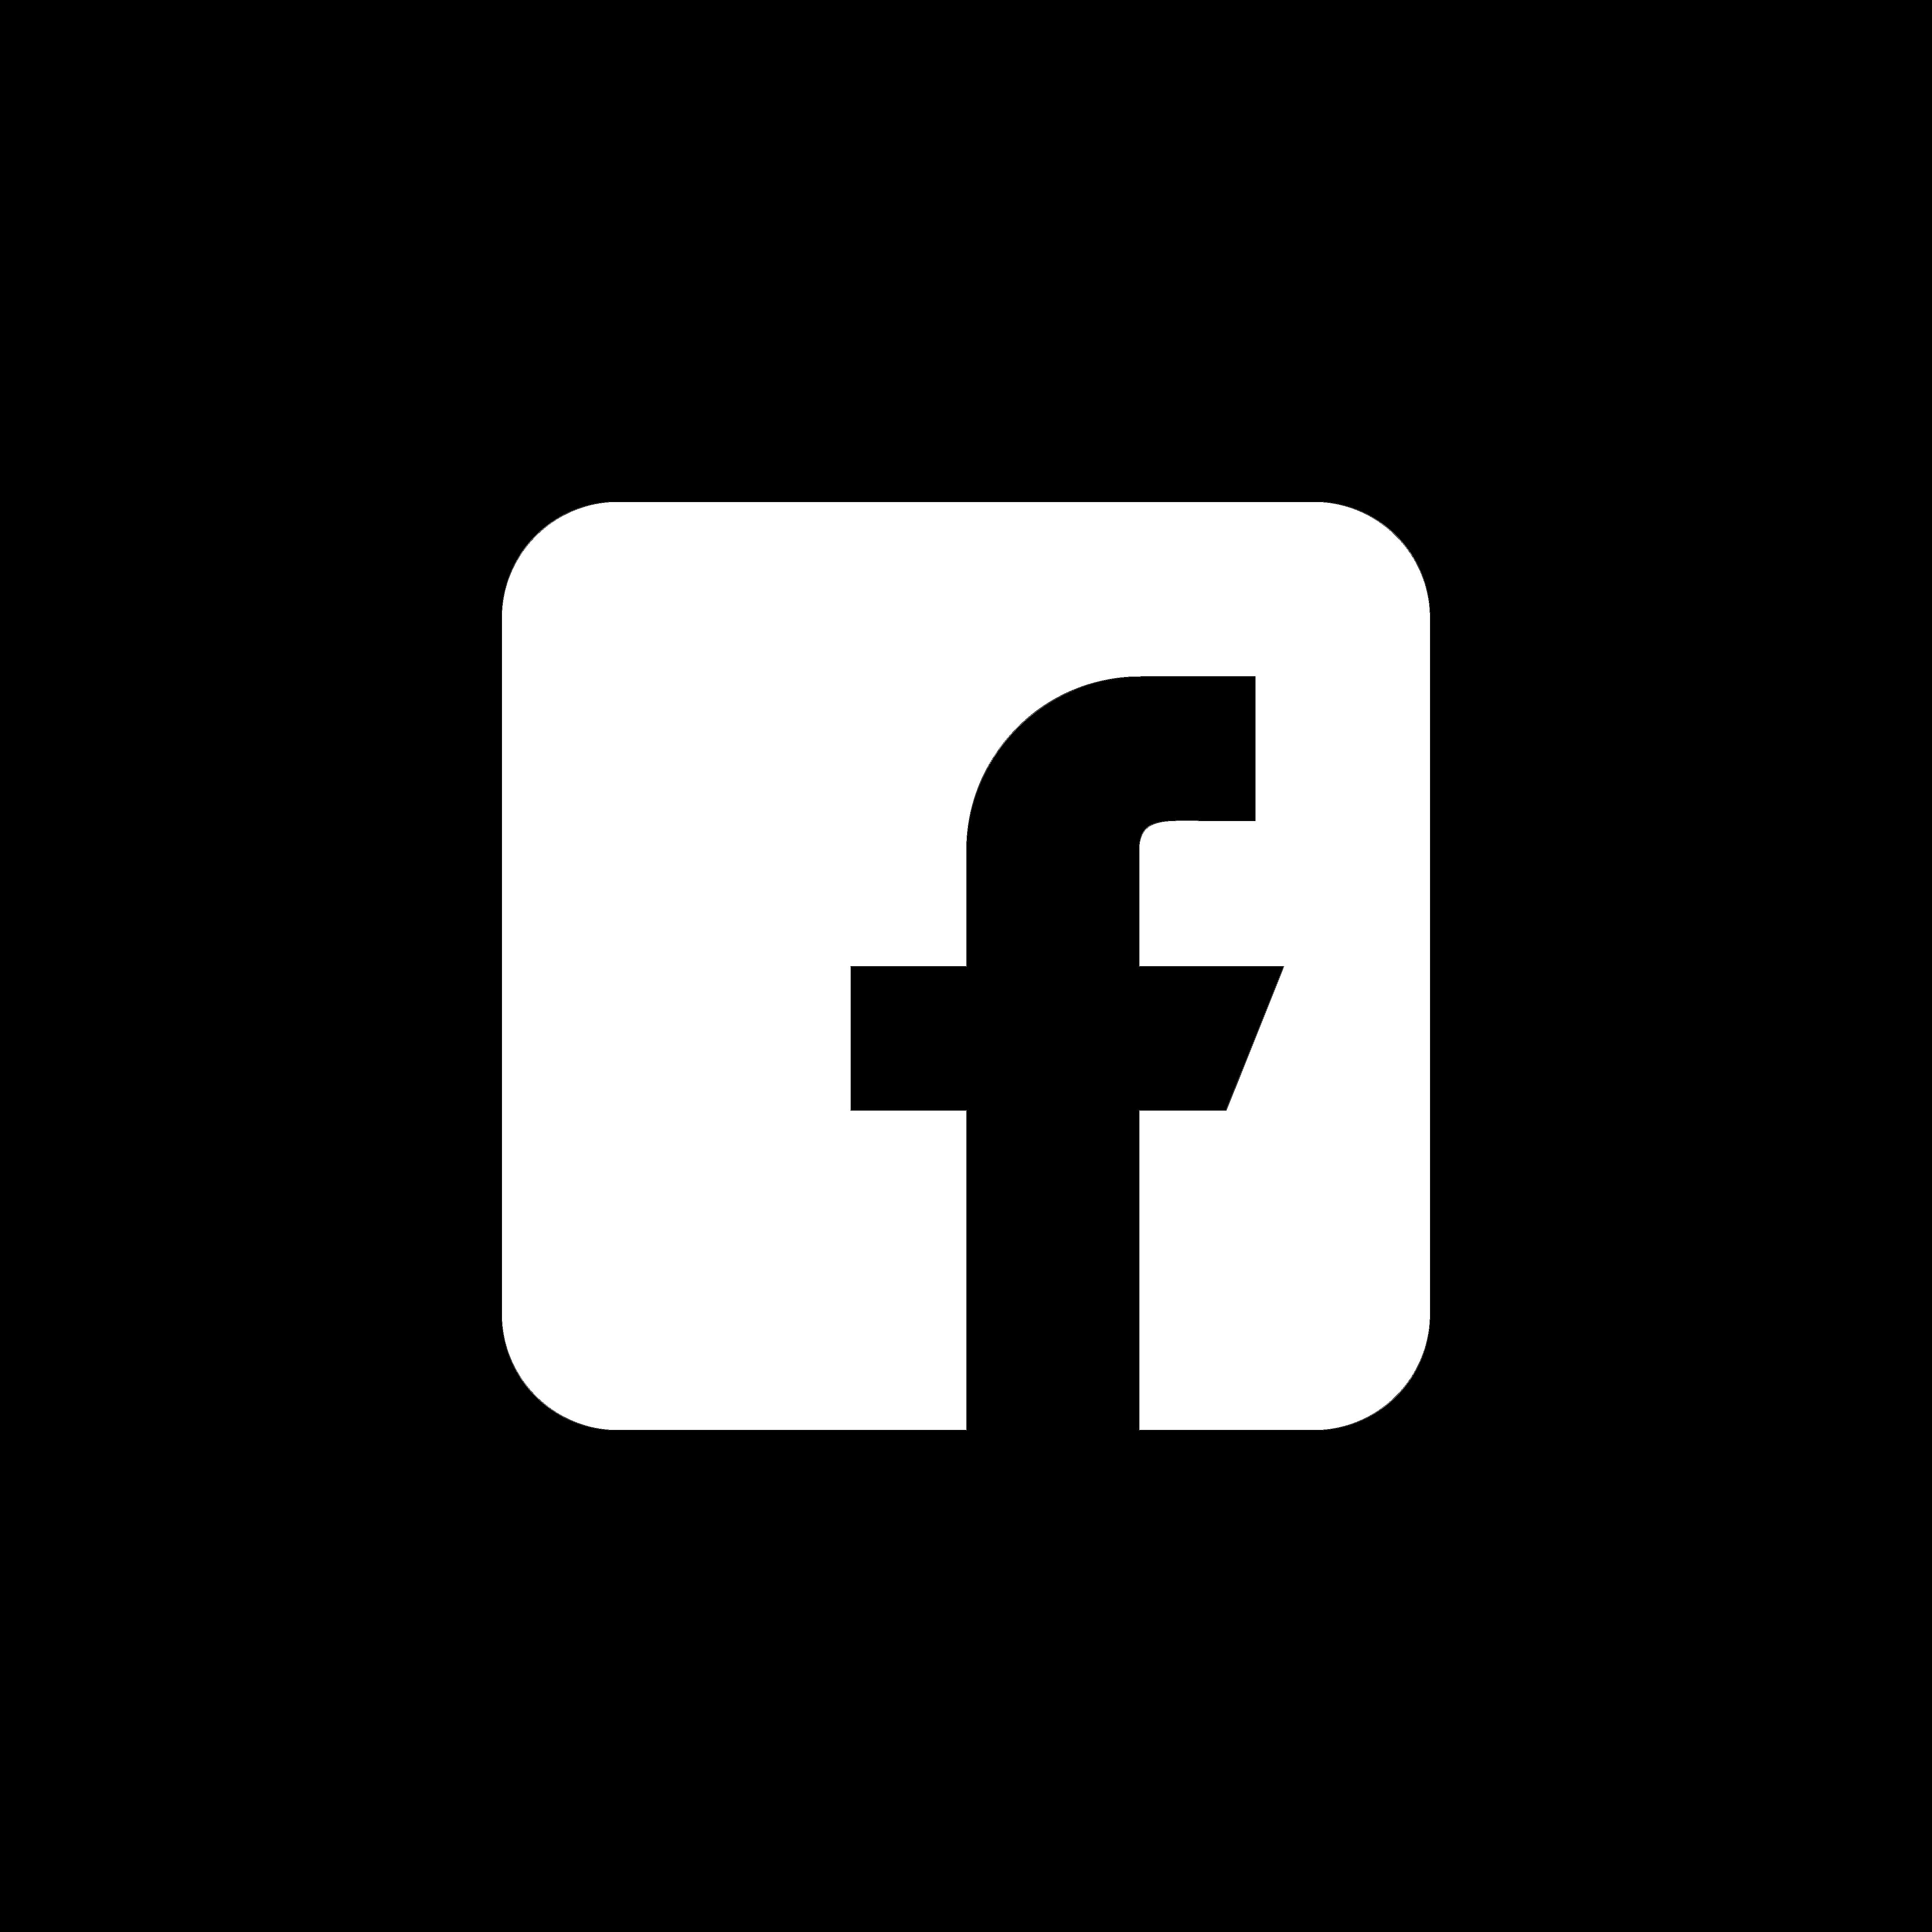 FB-04